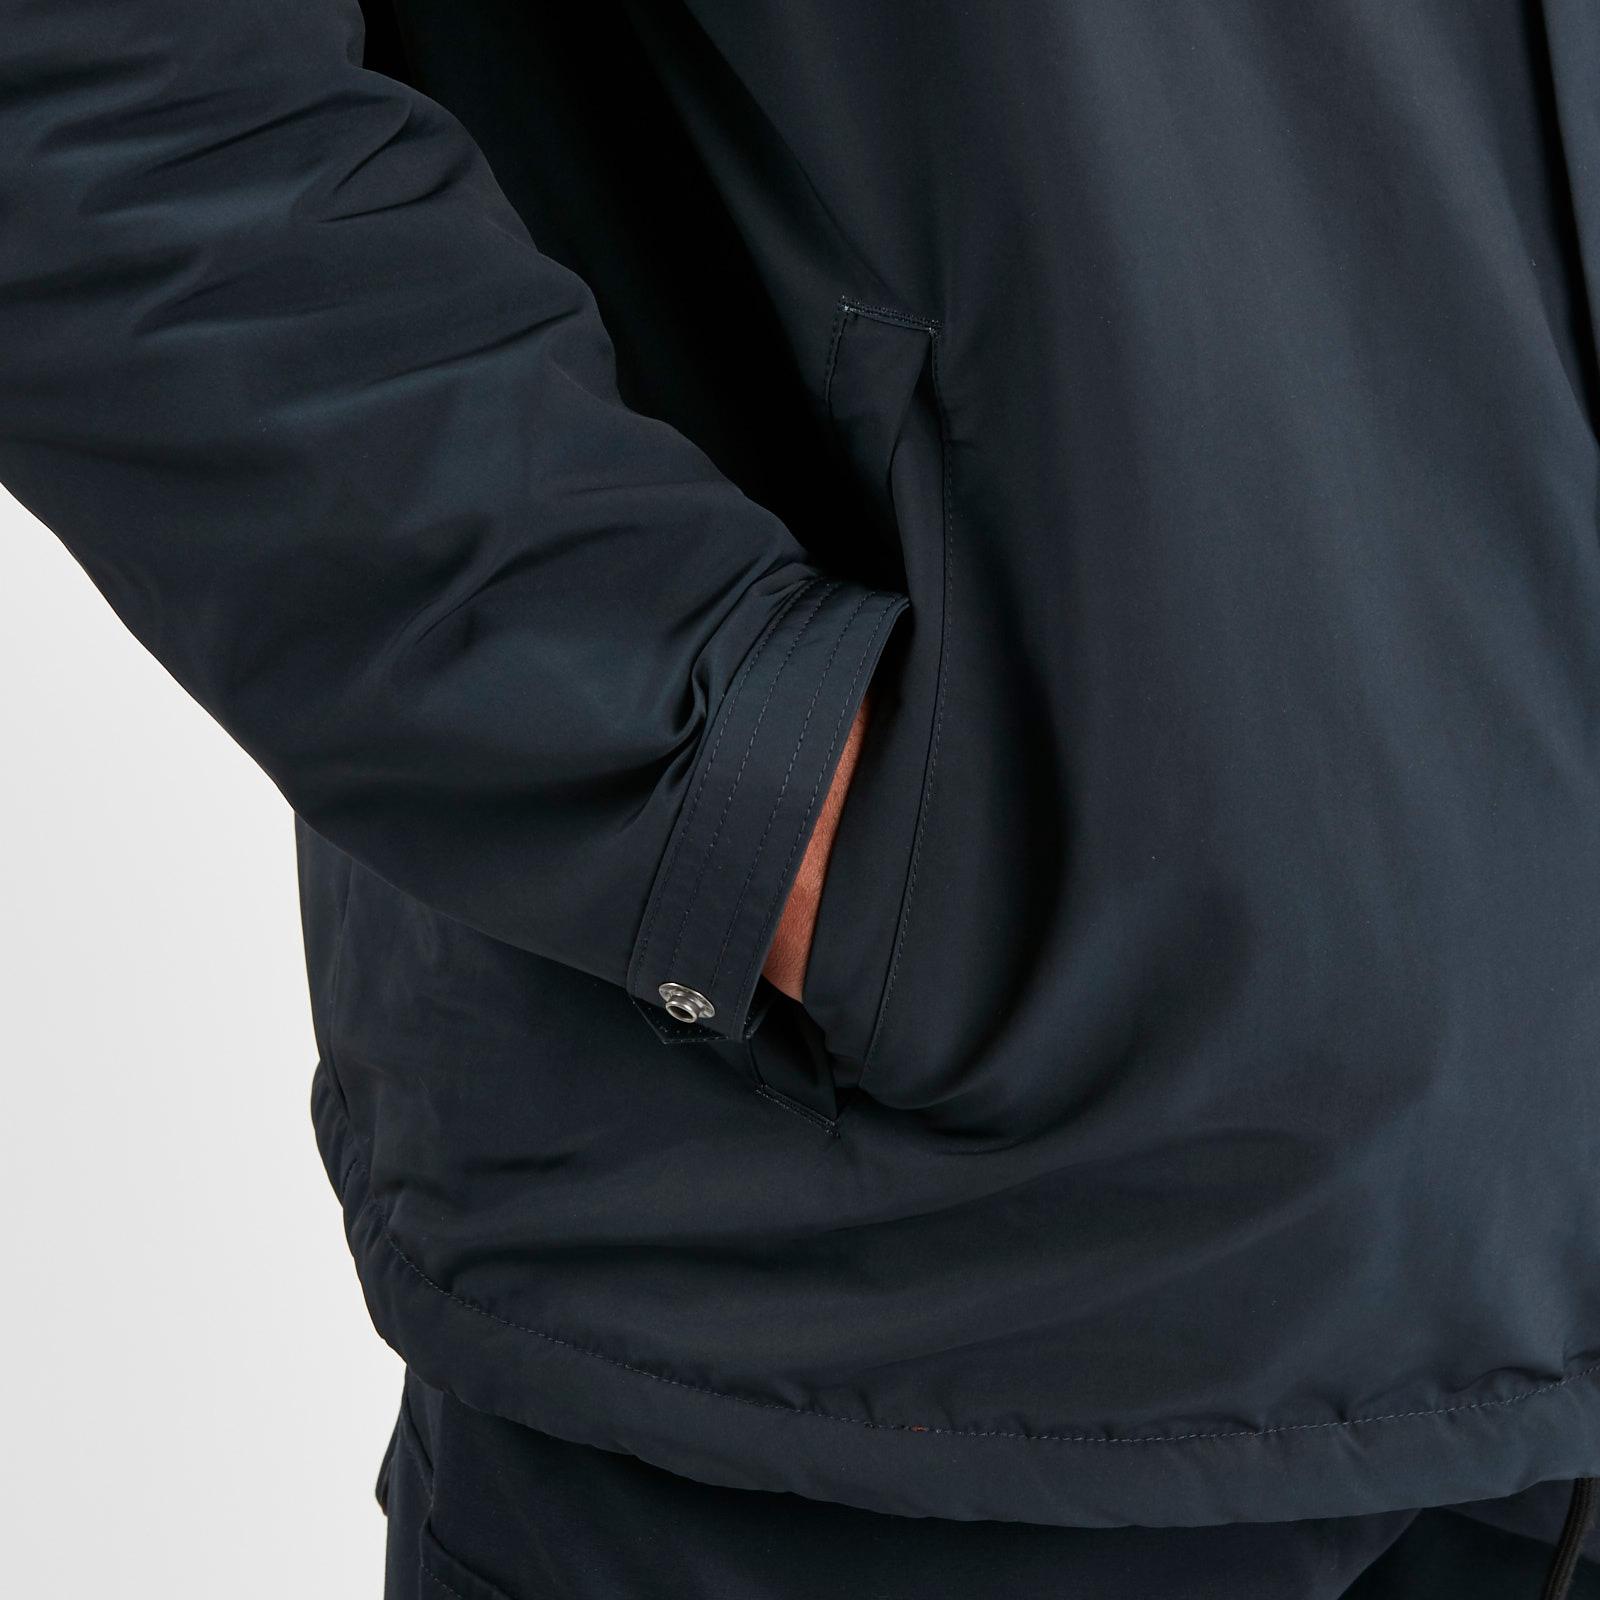 c8c043f2733f Nike NRG A2 Coach Jacket x Patta - Ah6488-476 - Sneakersnstuff ...